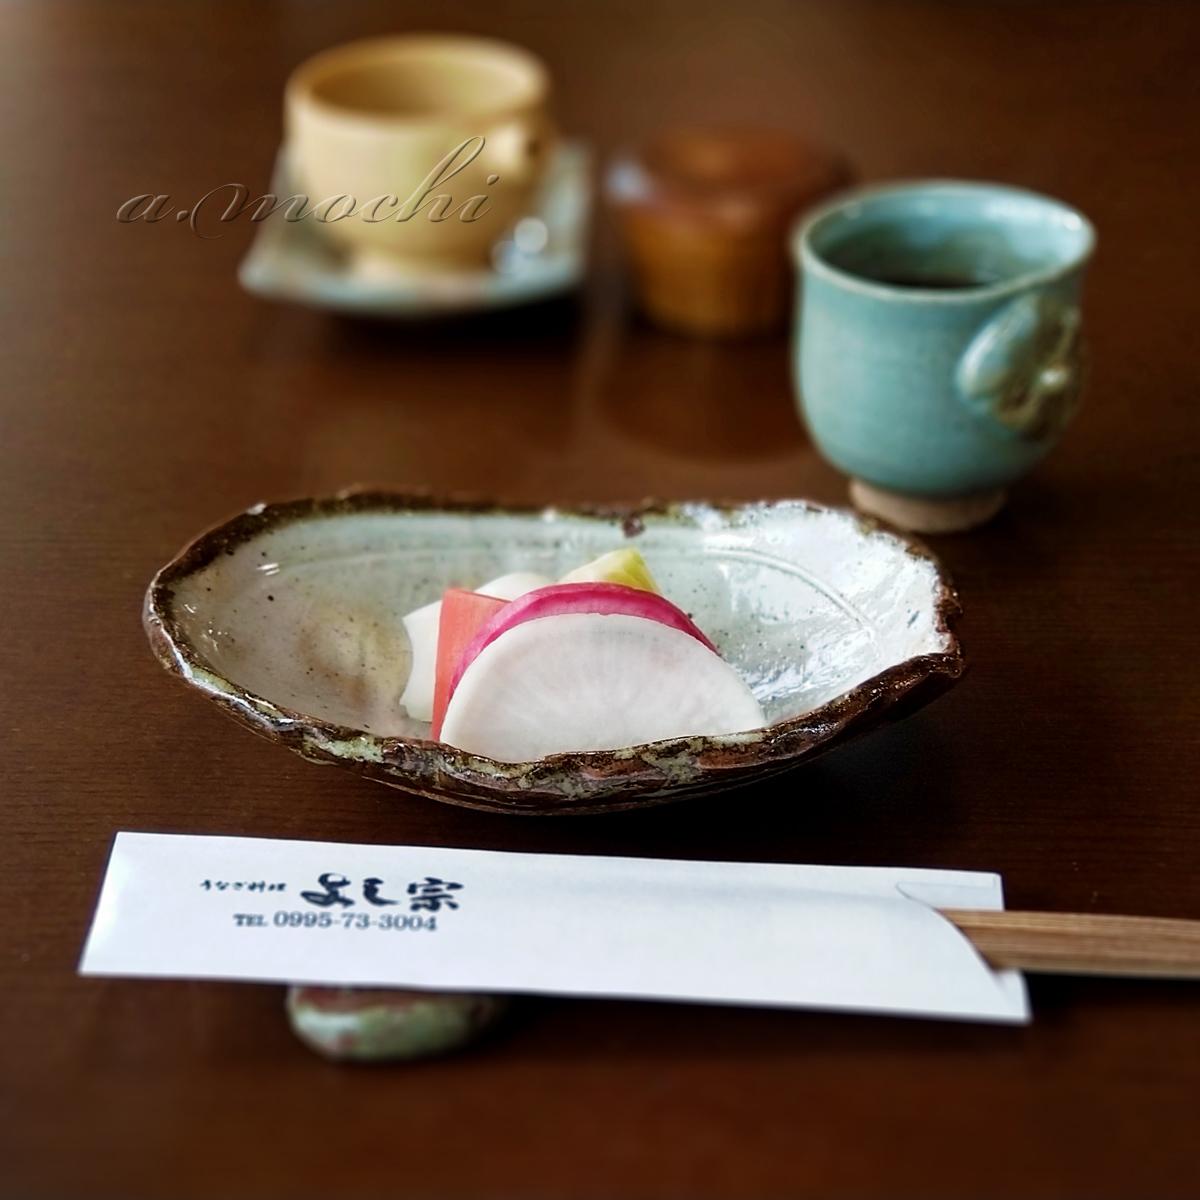 yoshimune_yukemono_210215.jpg